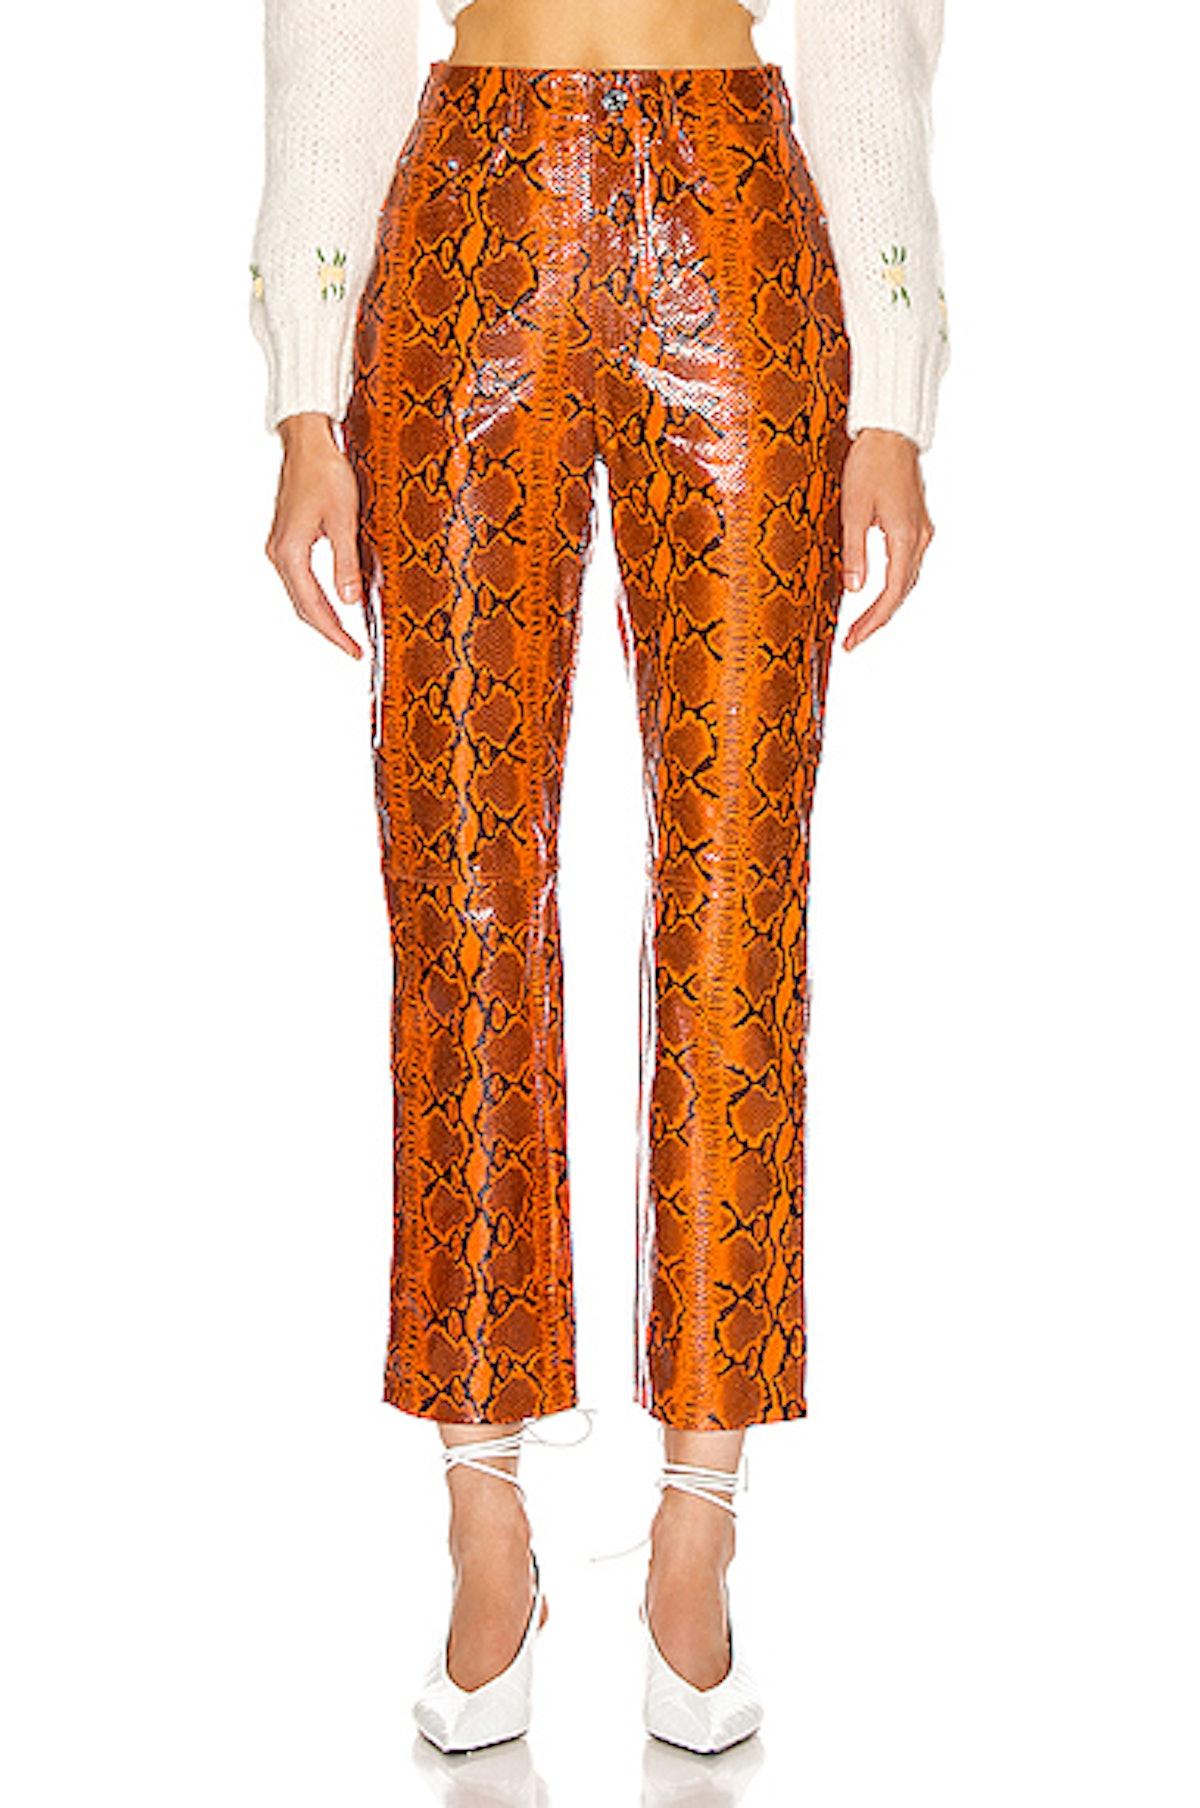 Shiloh Snake-Effect Leather Pants